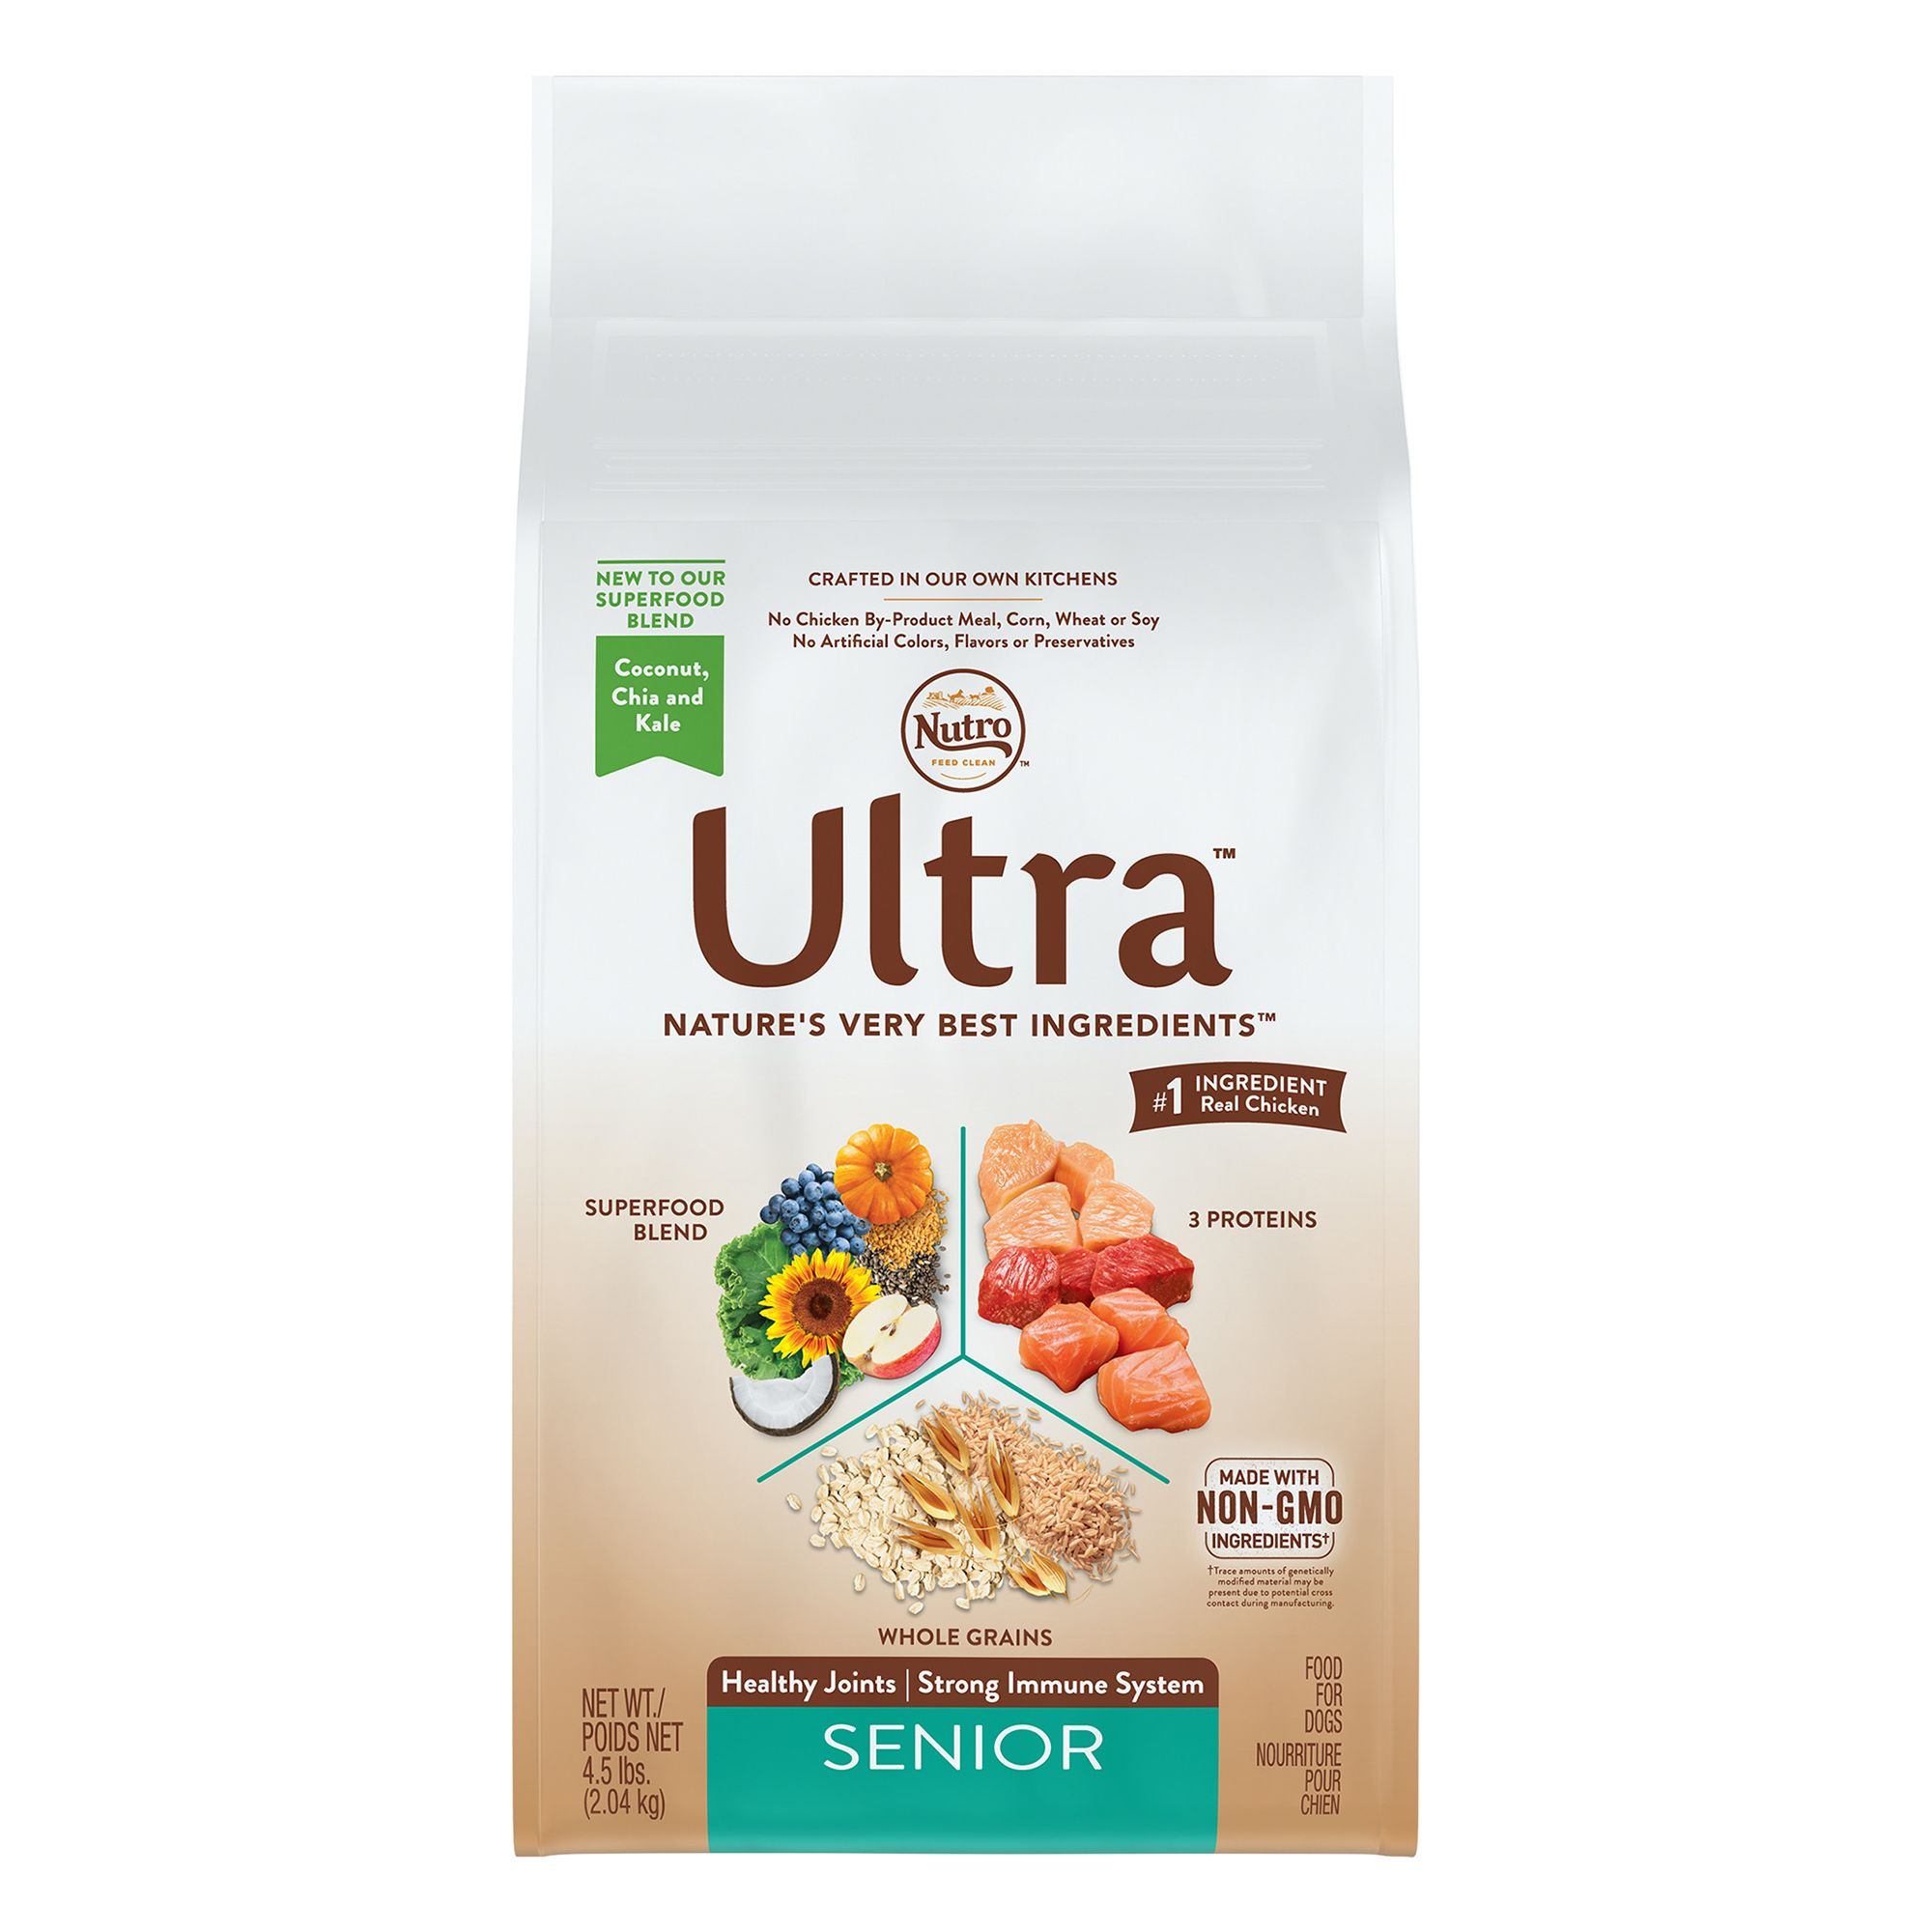 Nutro® Ultra, Senior Dog Food size: 4.5 Lb